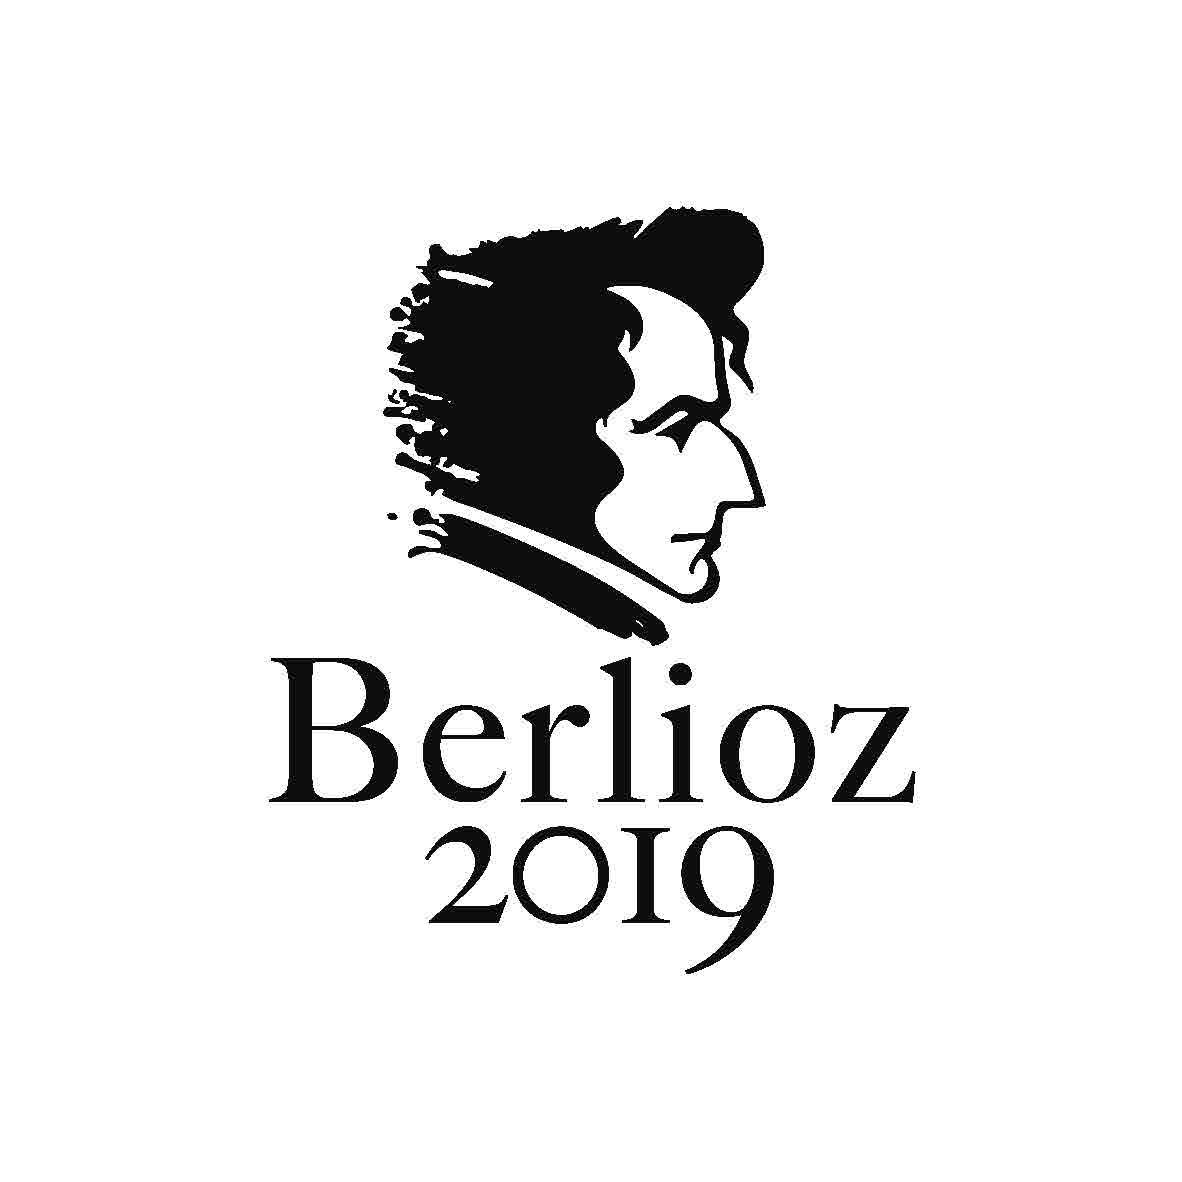 année Berlioz 2019